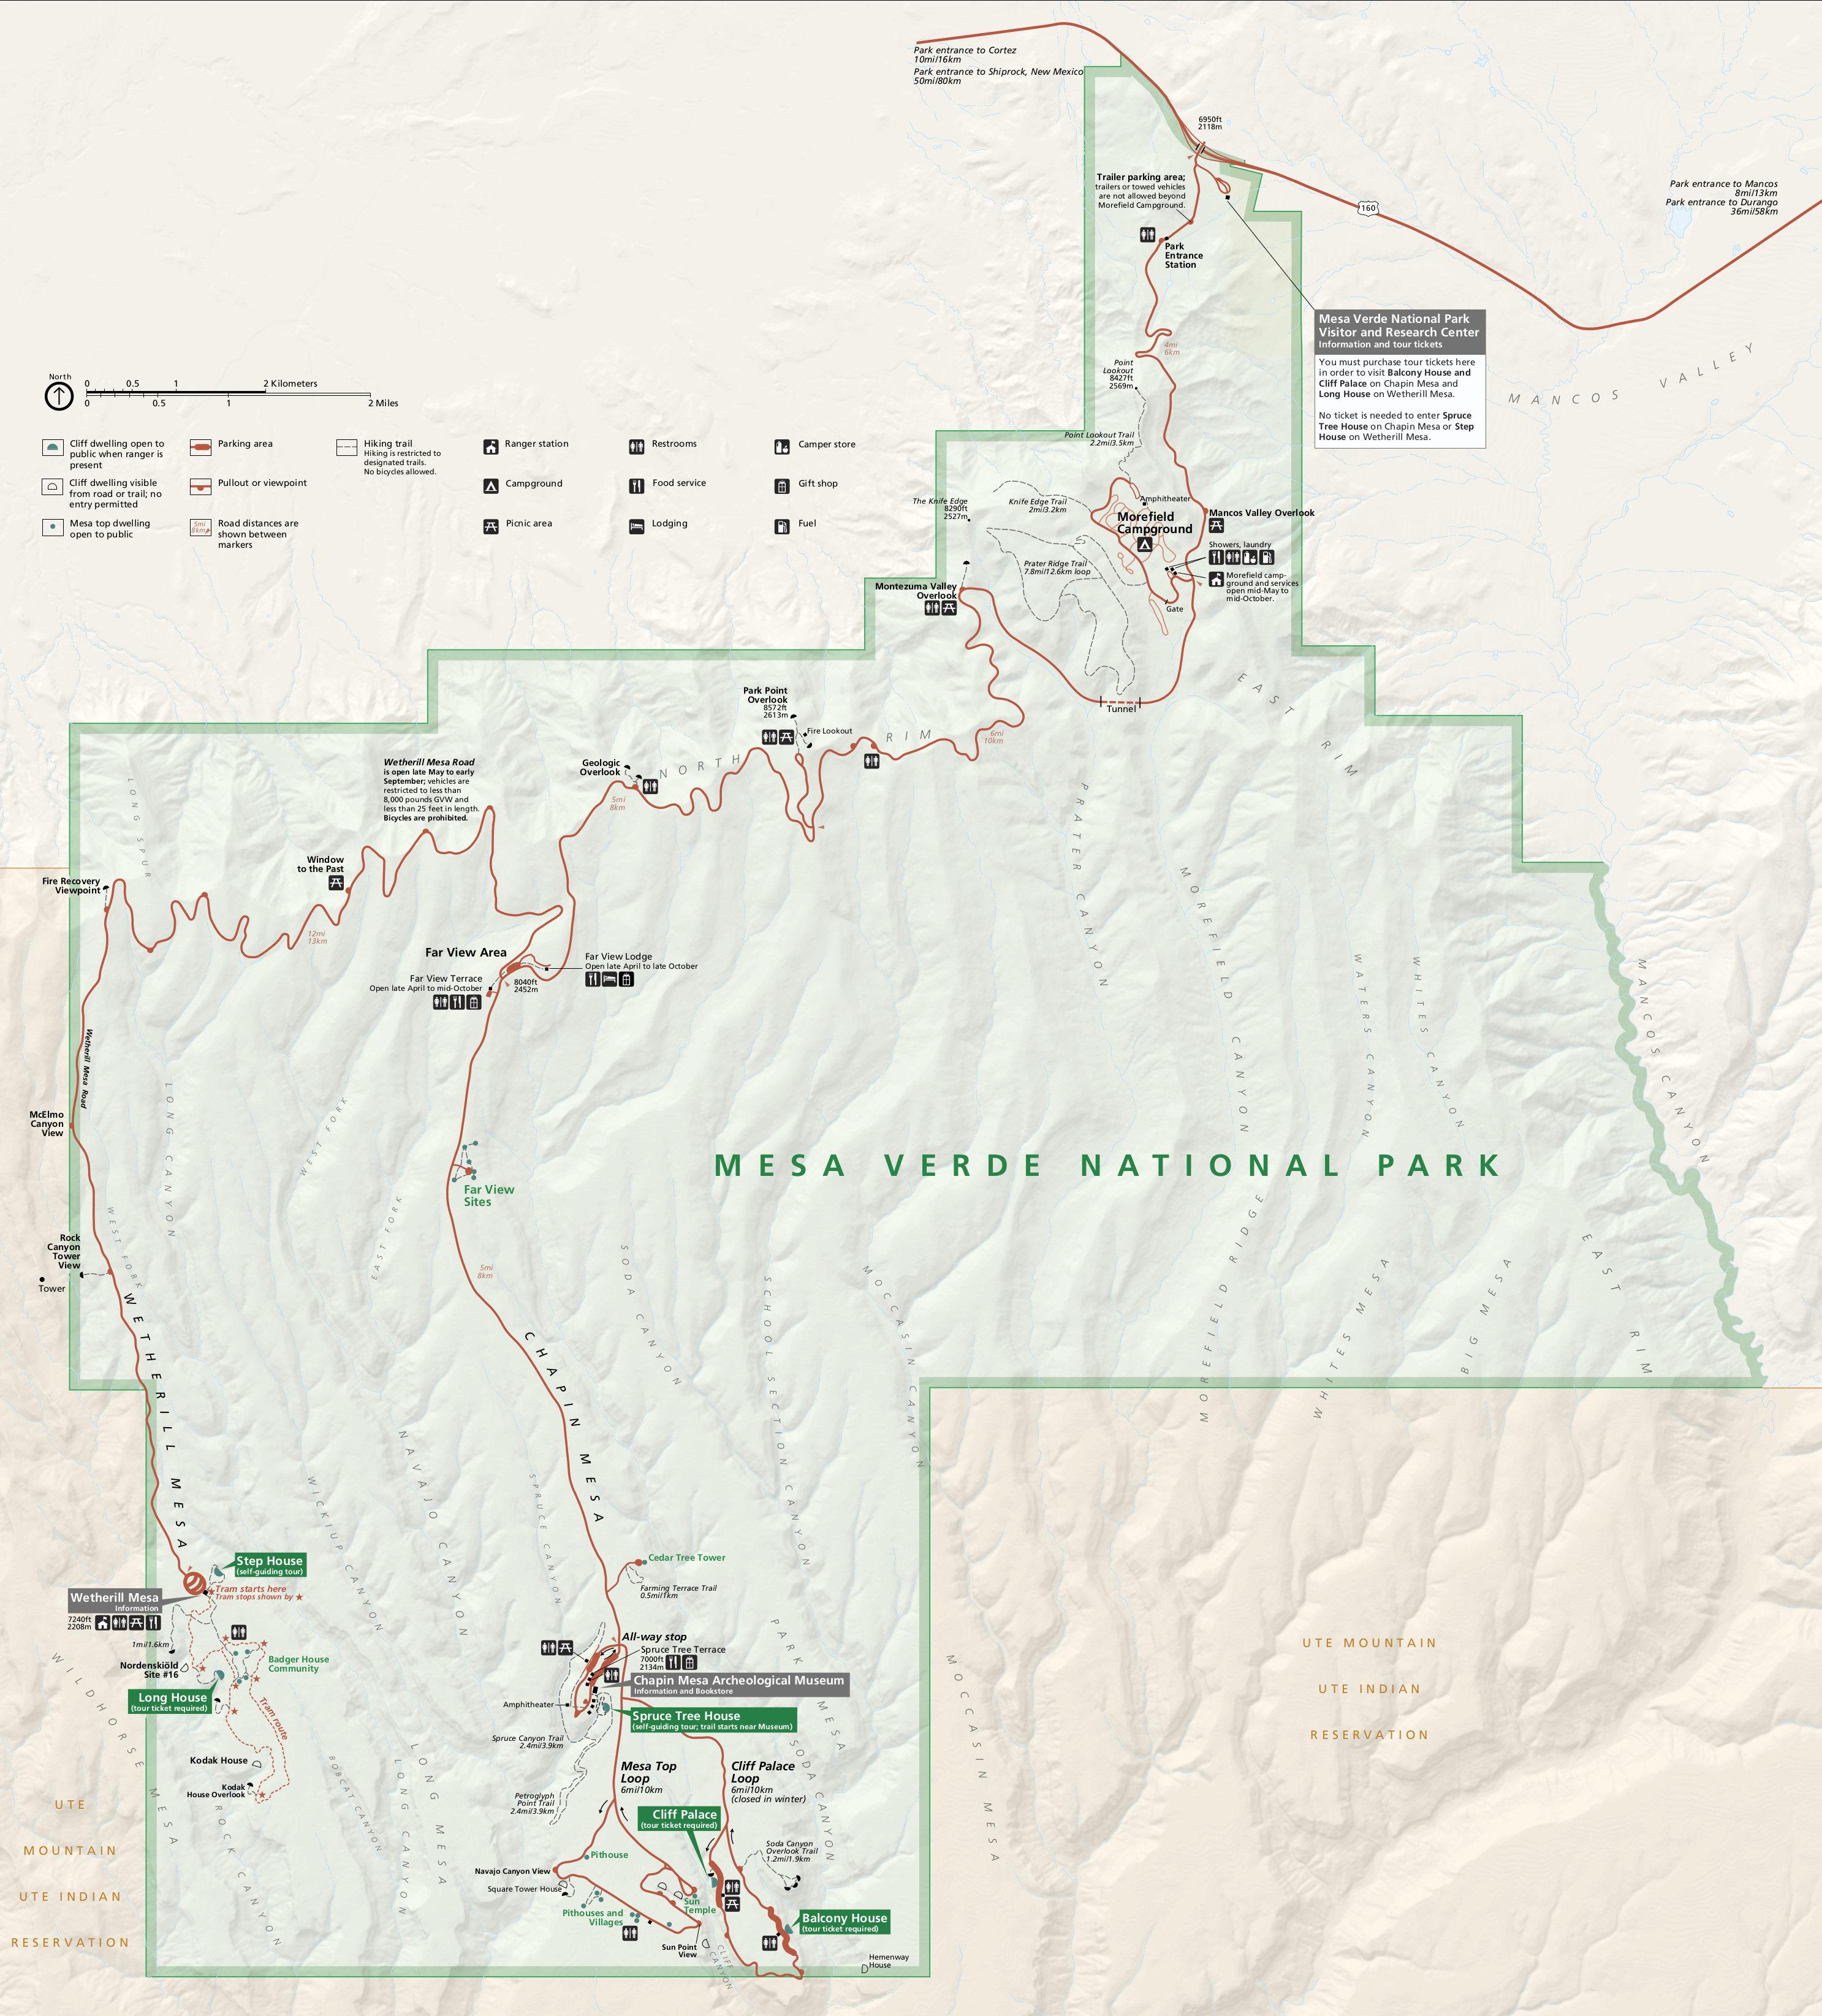 Mesa Verde National Park Map Mesa Verde Maps | NPMaps.  just free maps, period.